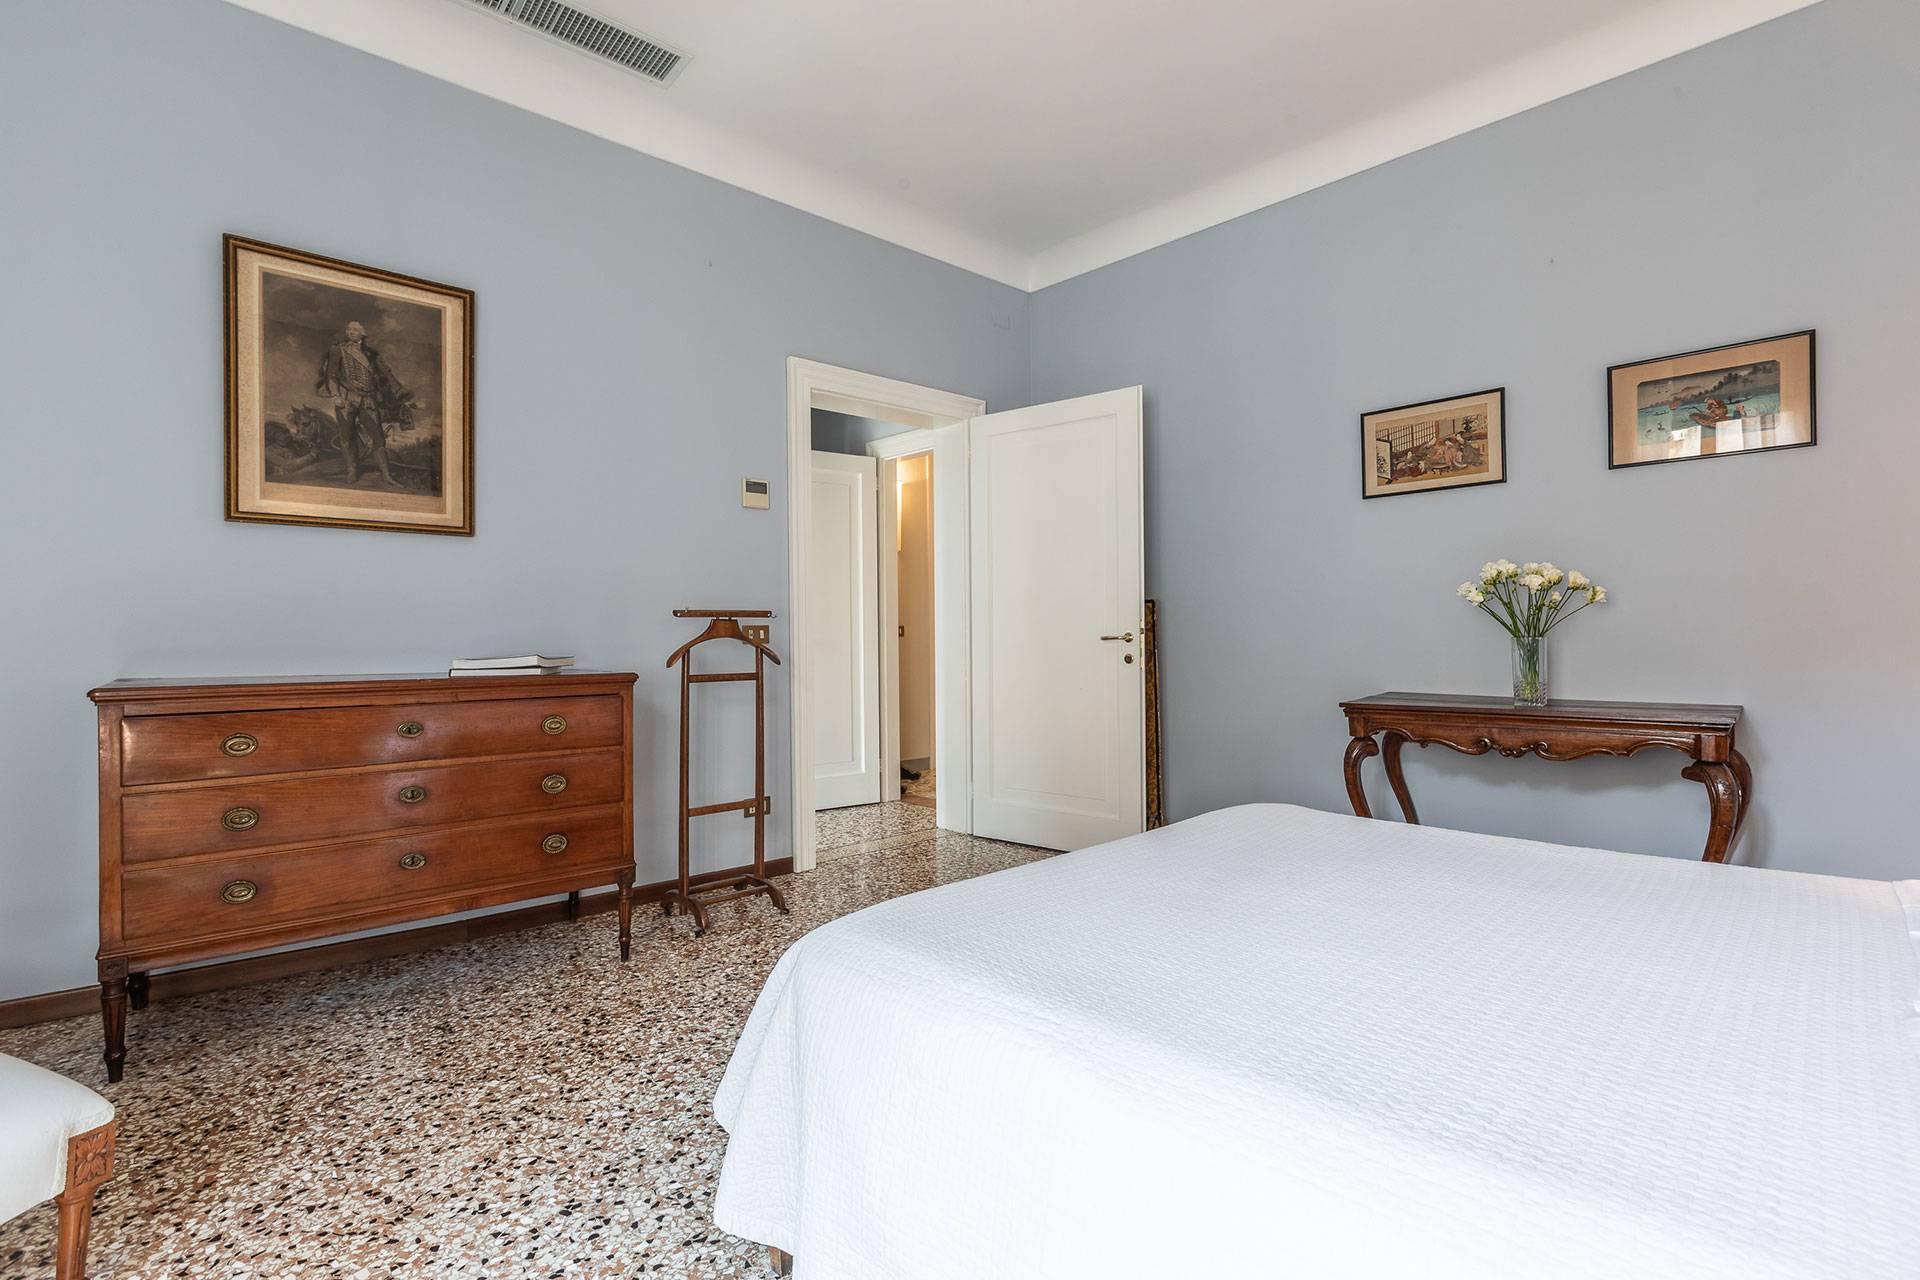 1st bedroom with ensuite bathroom